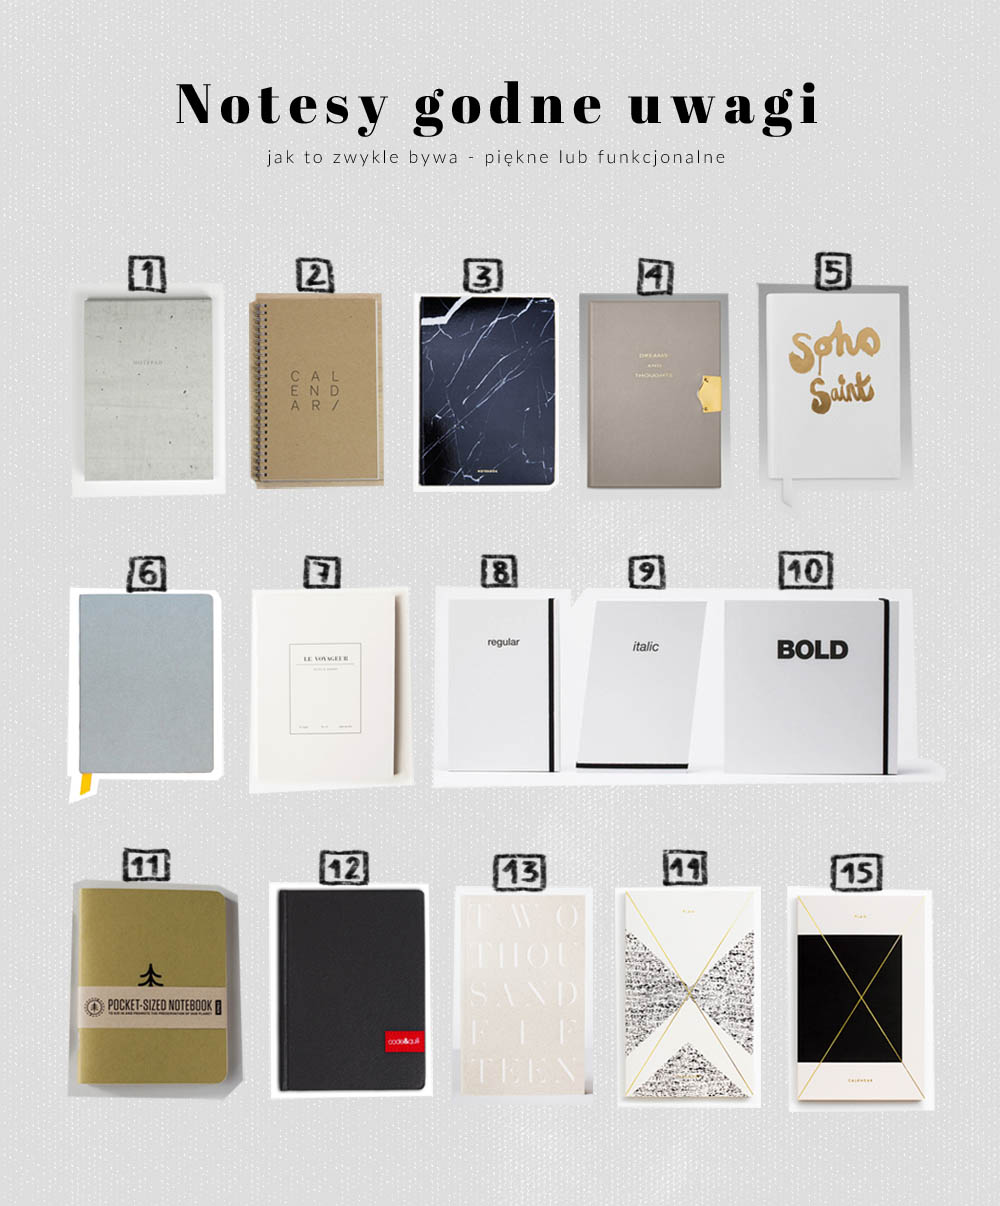 piękne funkcjonalne notesy prezent, ładne notesy, notatniki, kalendarze na prezent